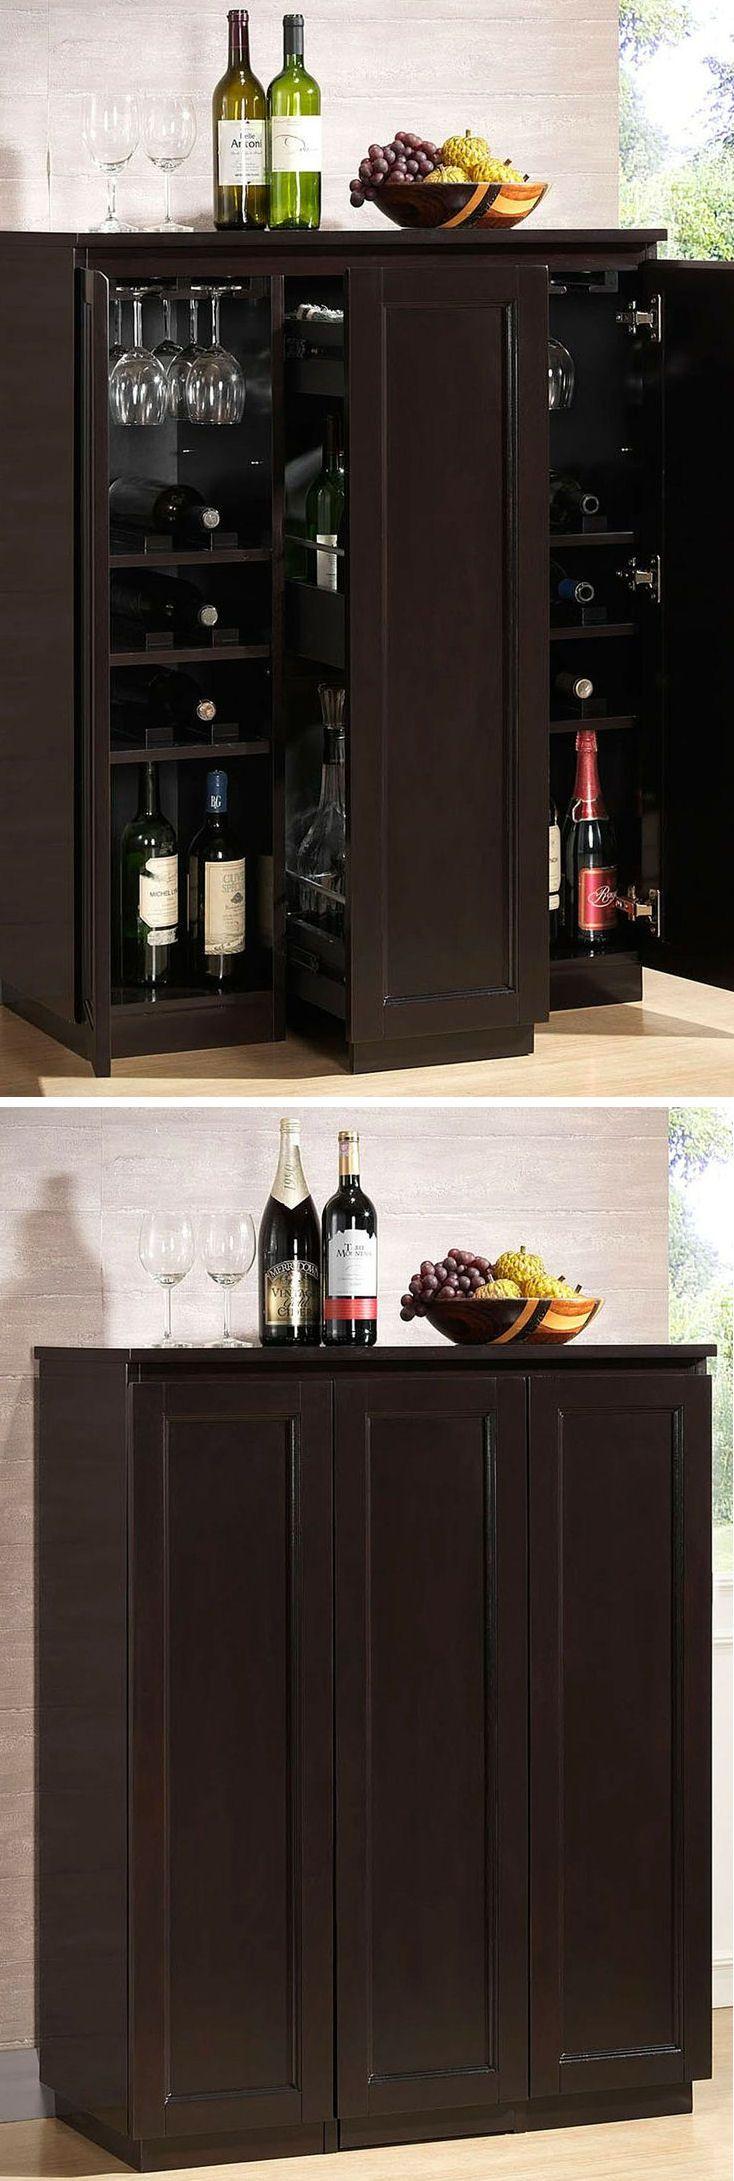 Enclosed Modern Bar Cabinet // #furniture #wine #spacesaving